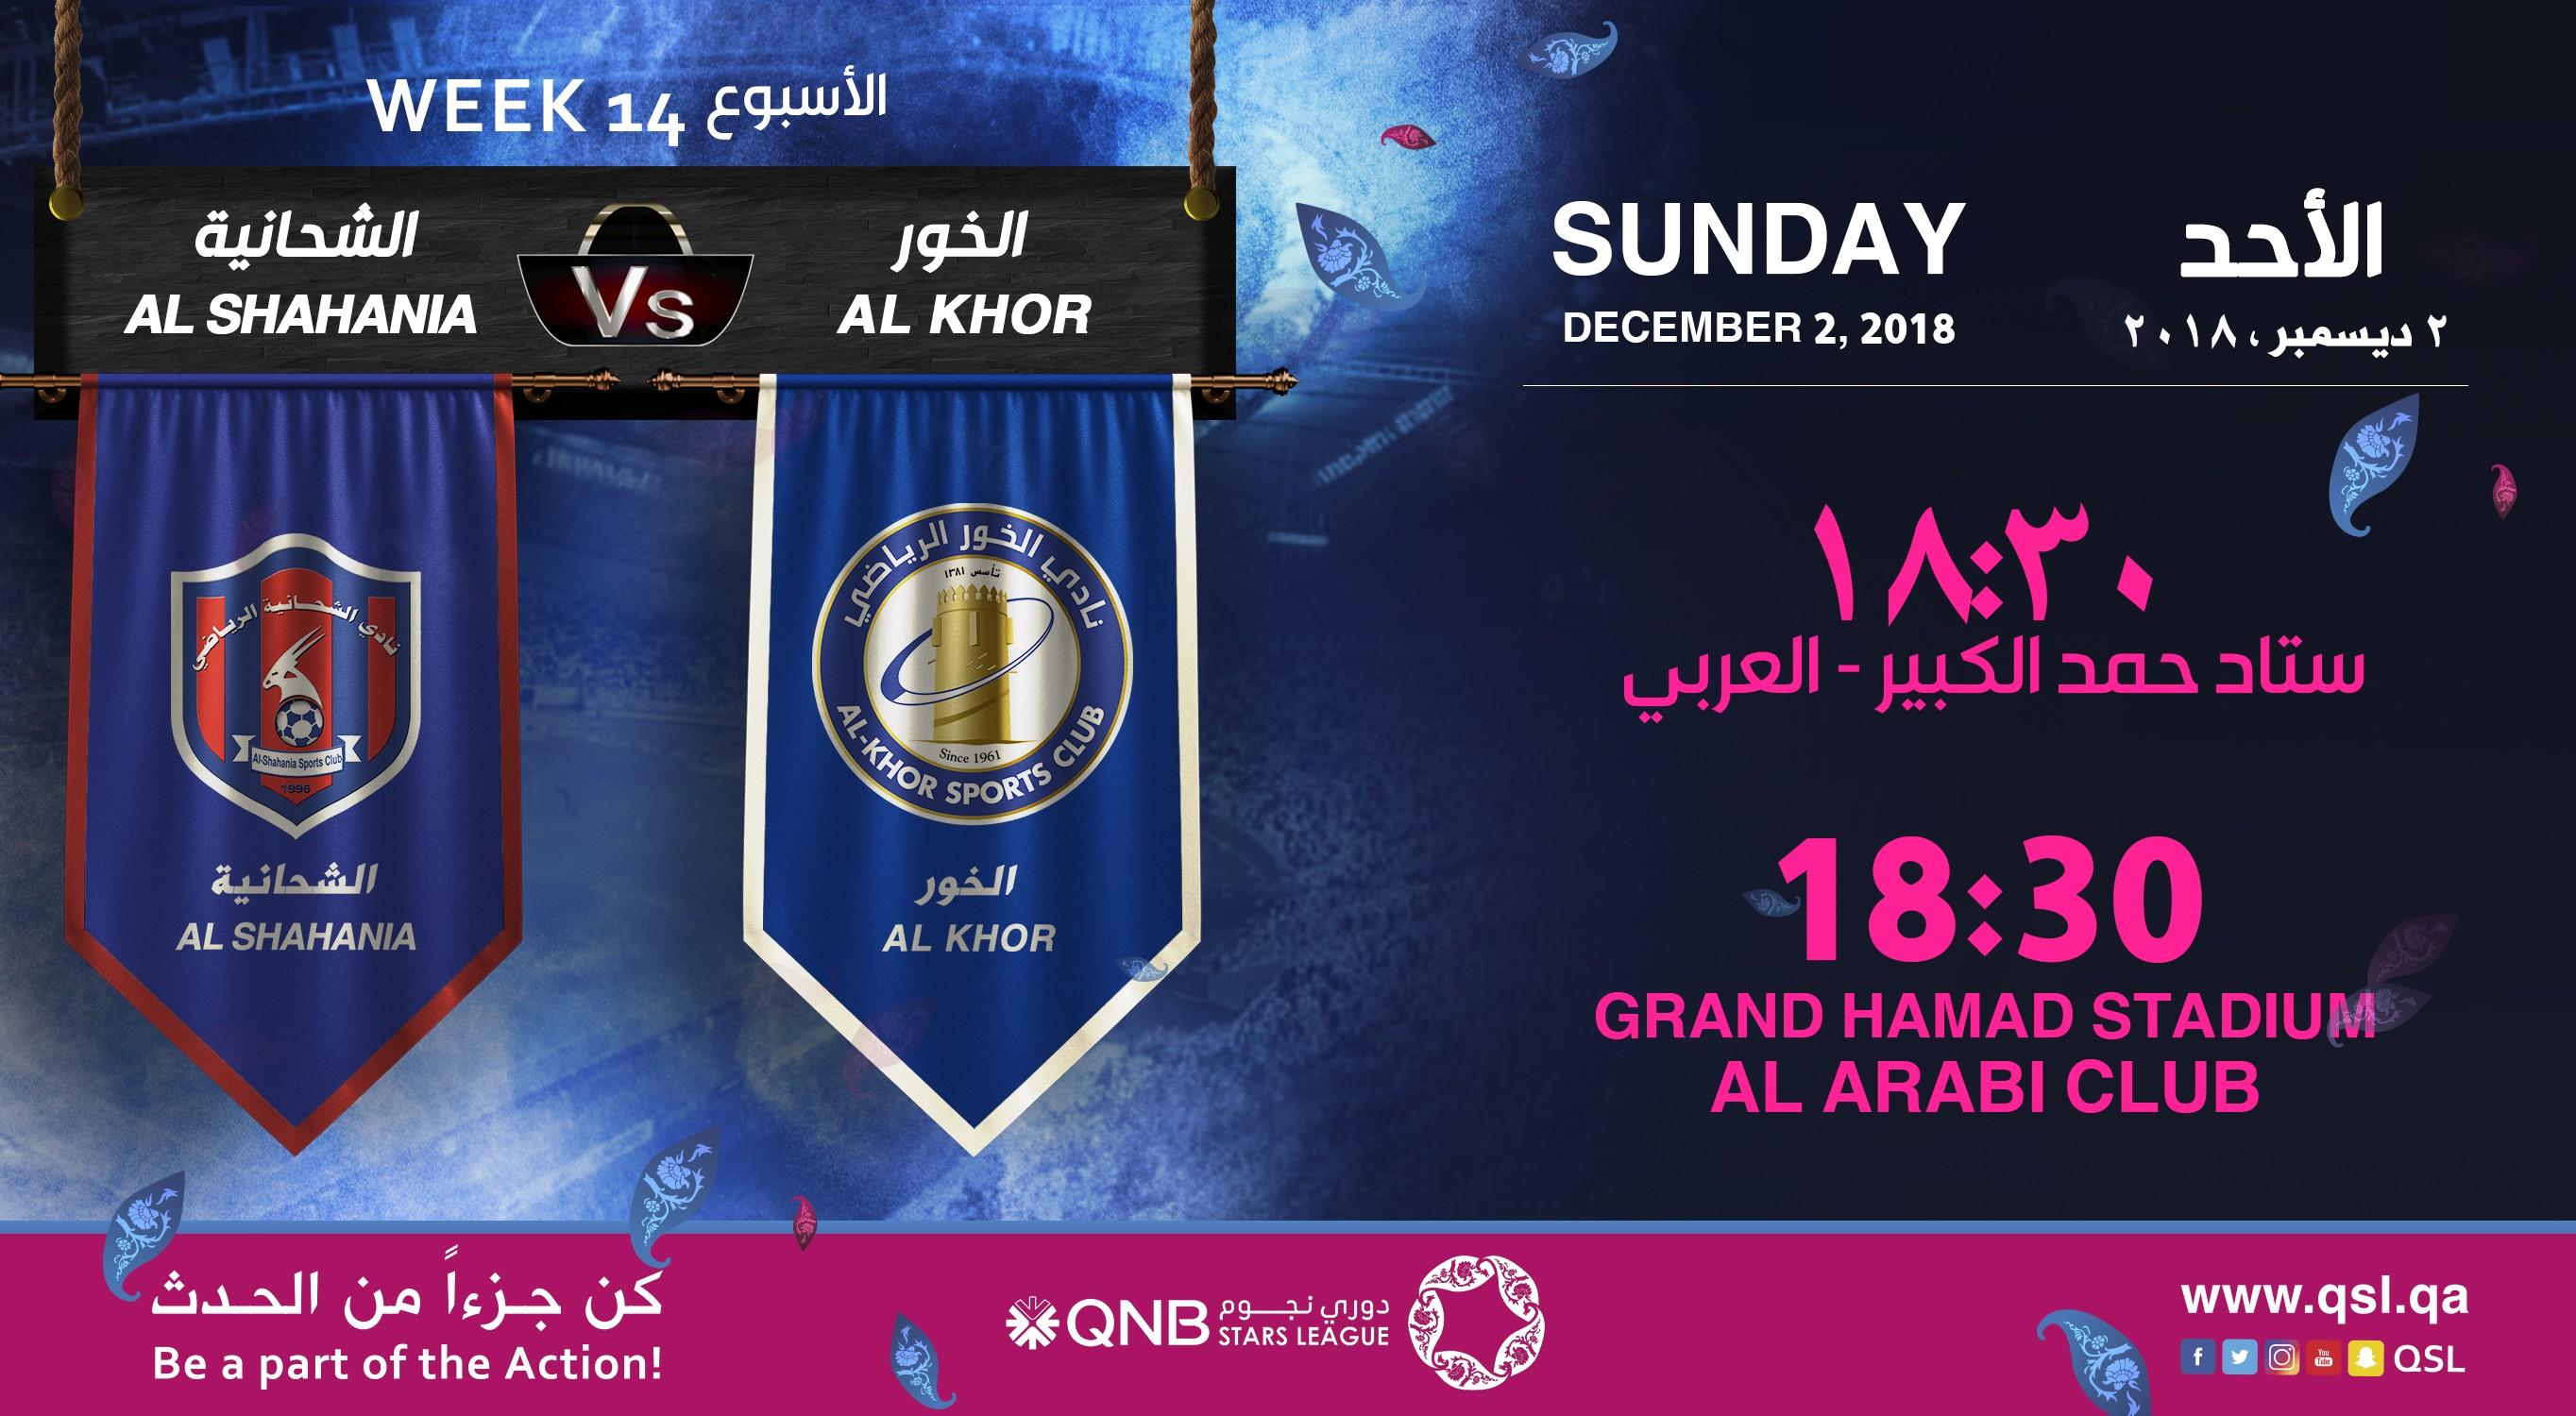 QNB Stars League Week 14 — Al Shahania vs Al Khor